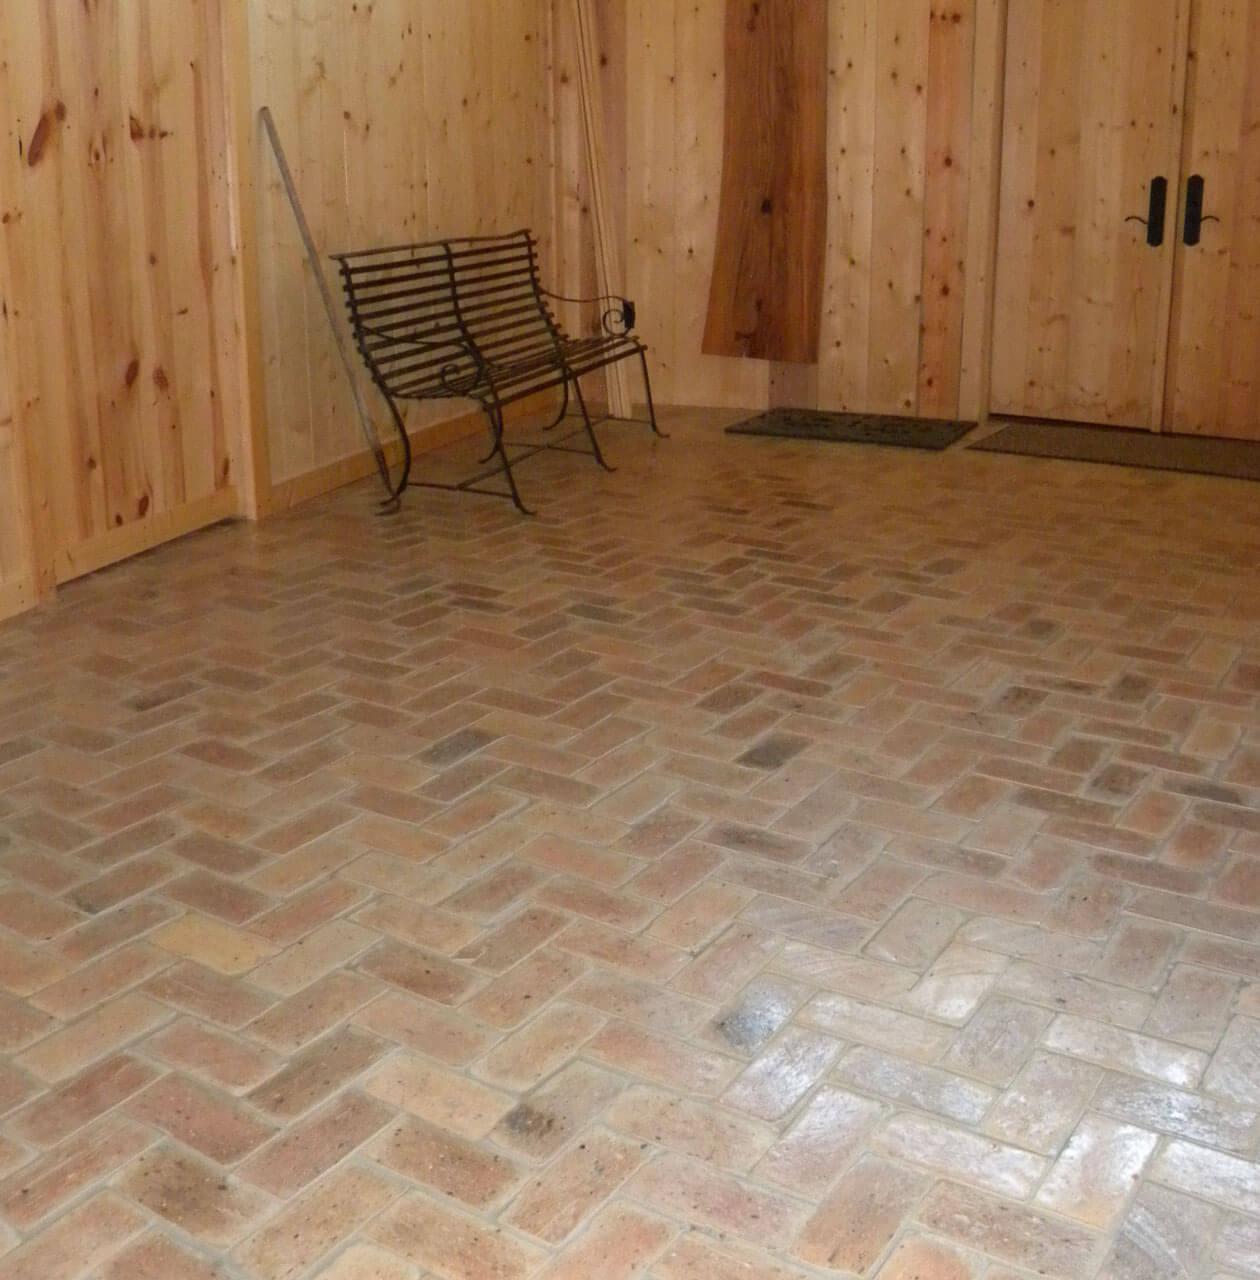 Brick Floor Tile Gallery Real Brick Wall Tiles - Brick pavers for indoor floors